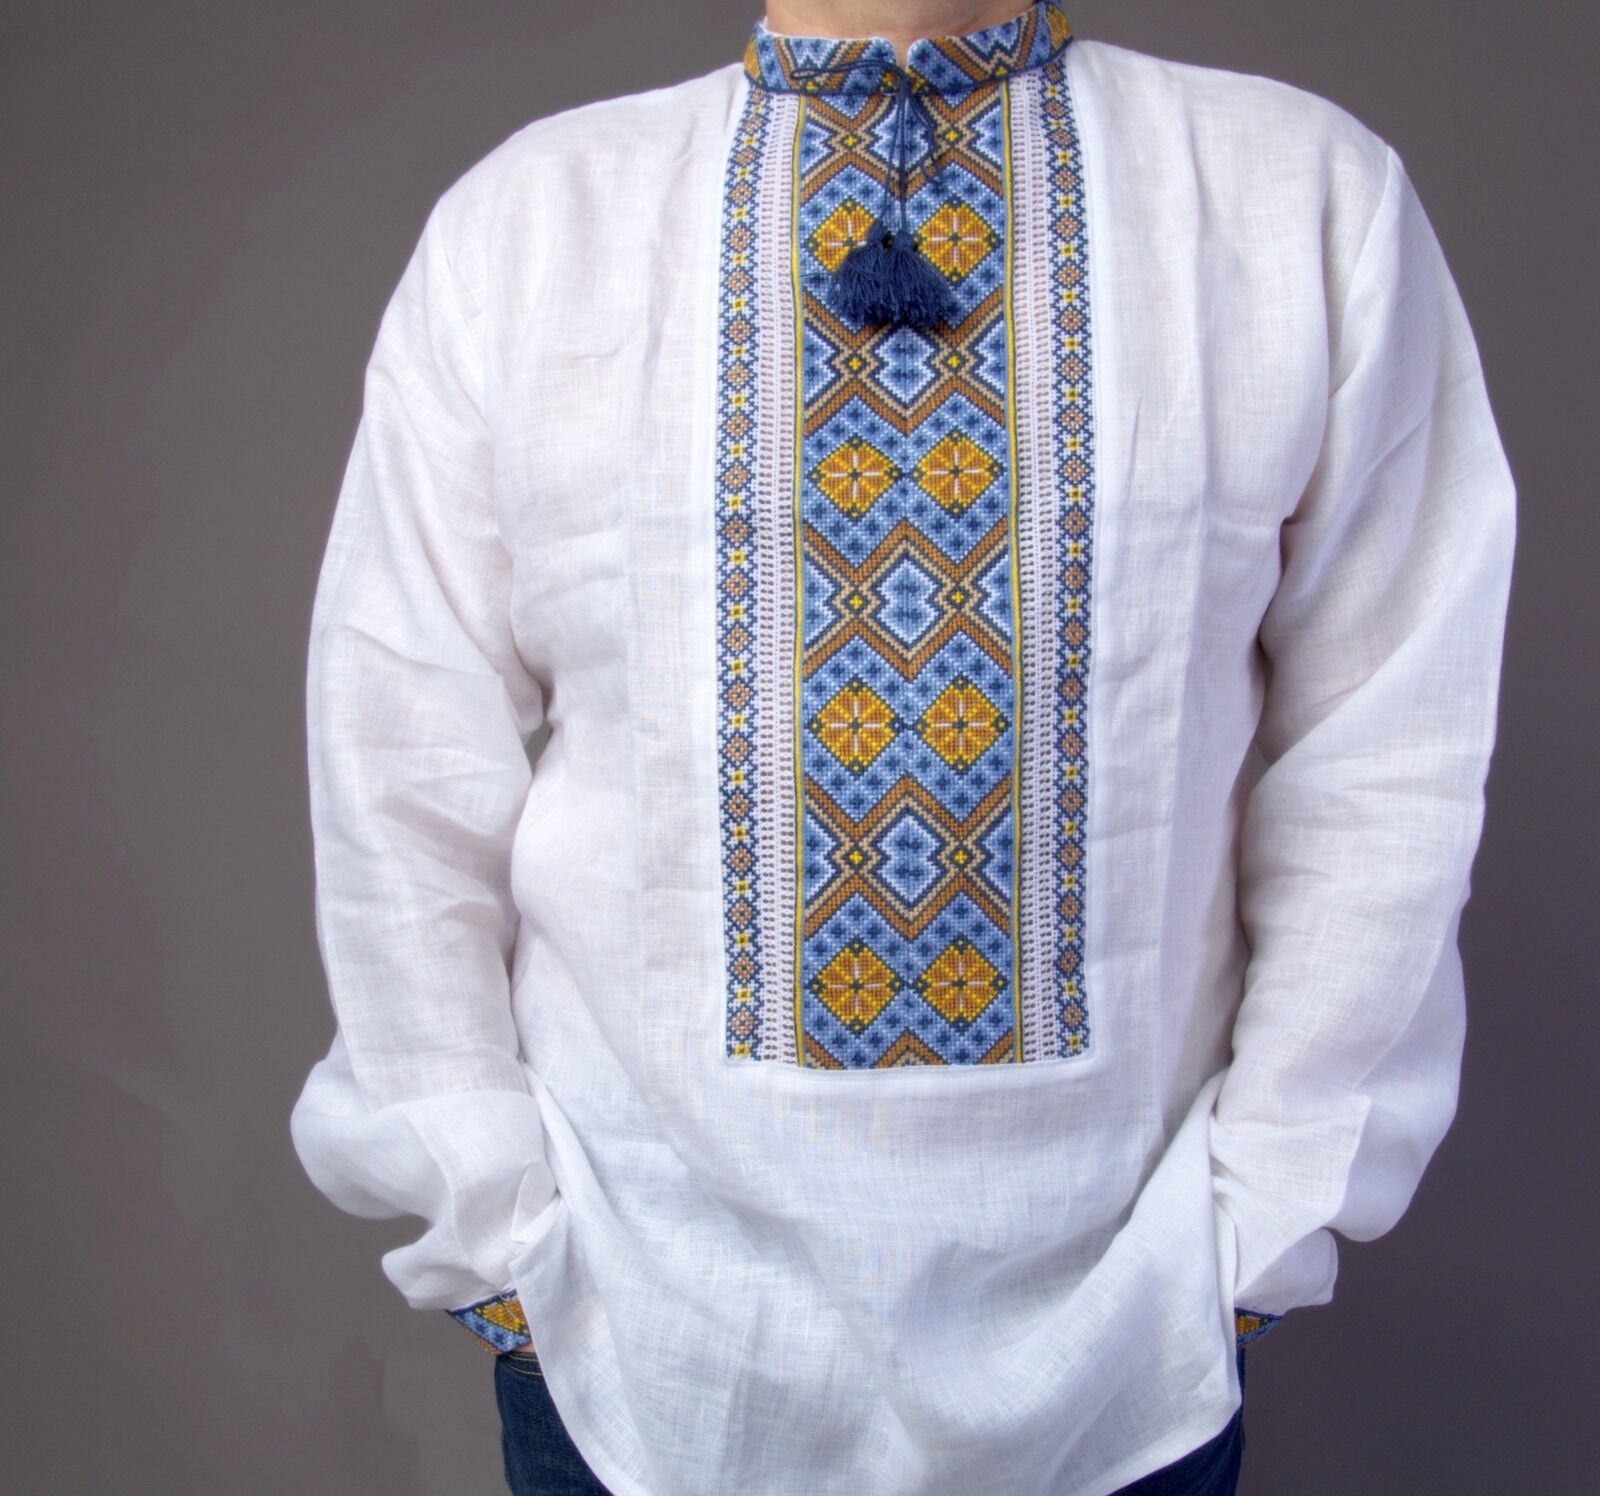 VYSHYVANKA Mens Ukrainian Embroidered LINEN White SHIRT S-4XL GIFT FOR DAD IDEA